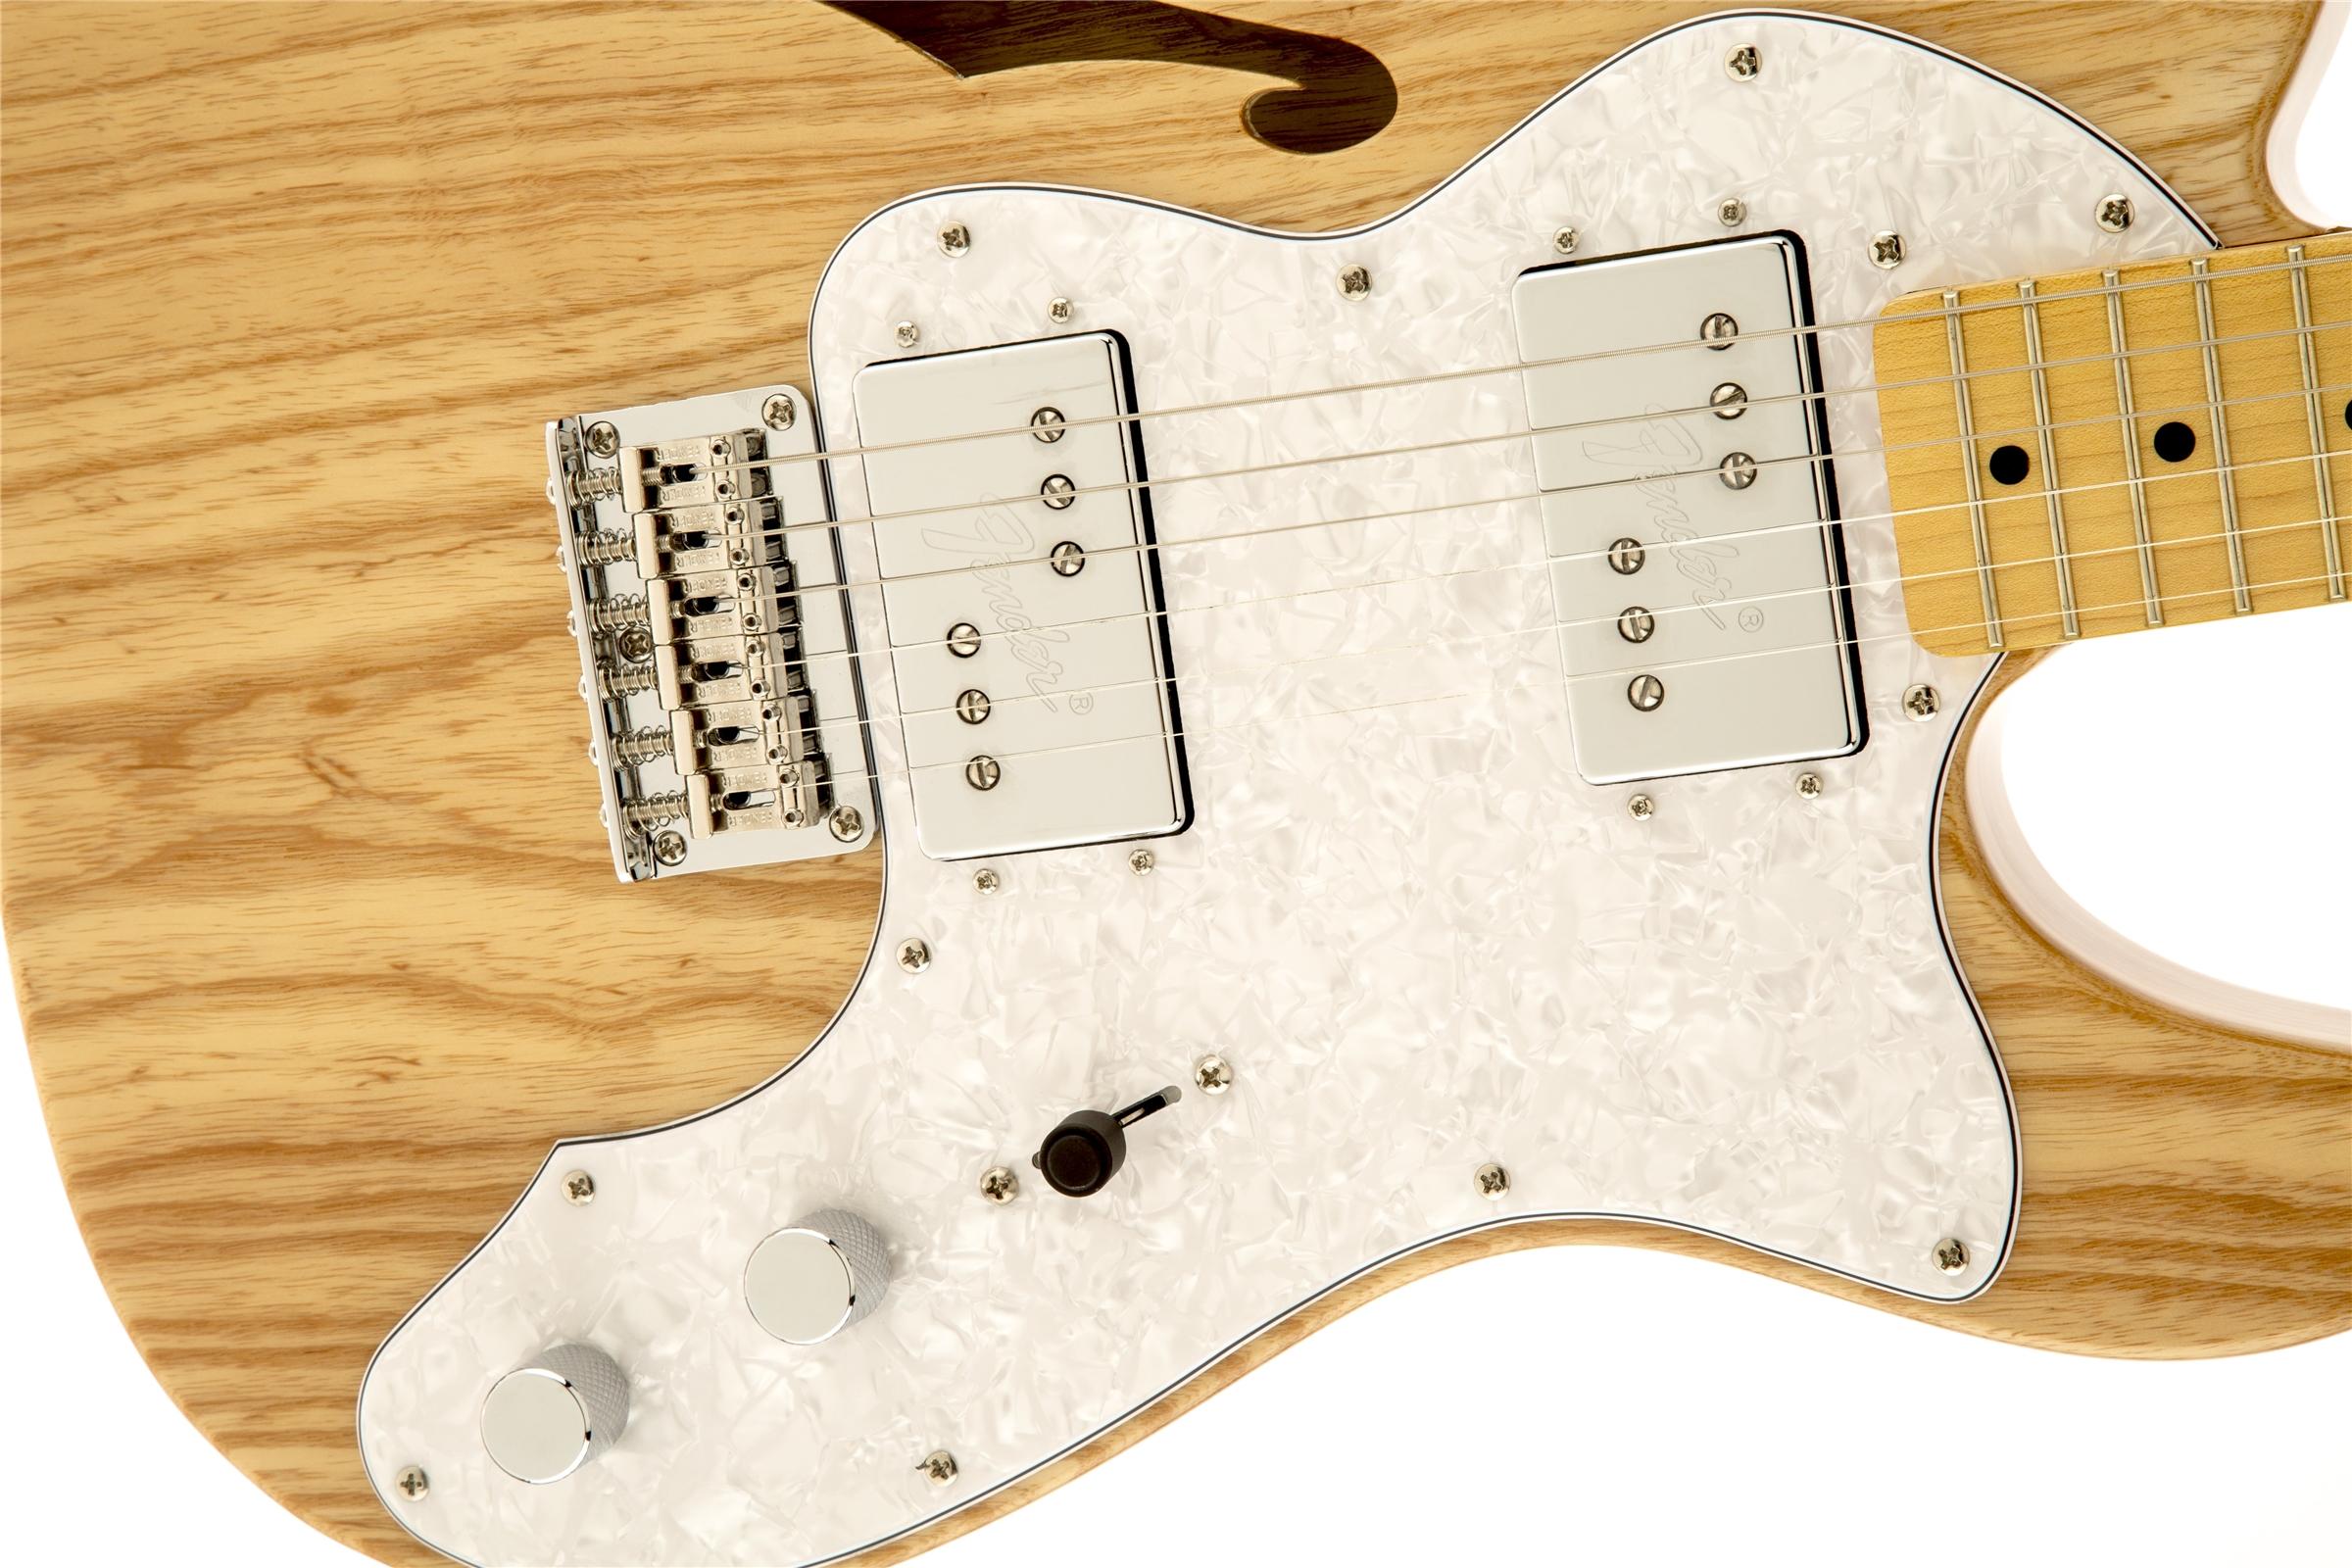 [SCHEMATICS_4HG]  FE_9592] Thinline Tele Wiring Diagram | Wiring Diagram For A 72 Fender Thinline Telecaster |  | Phil Trua Umng Mohammedshrine Librar Wiring 101